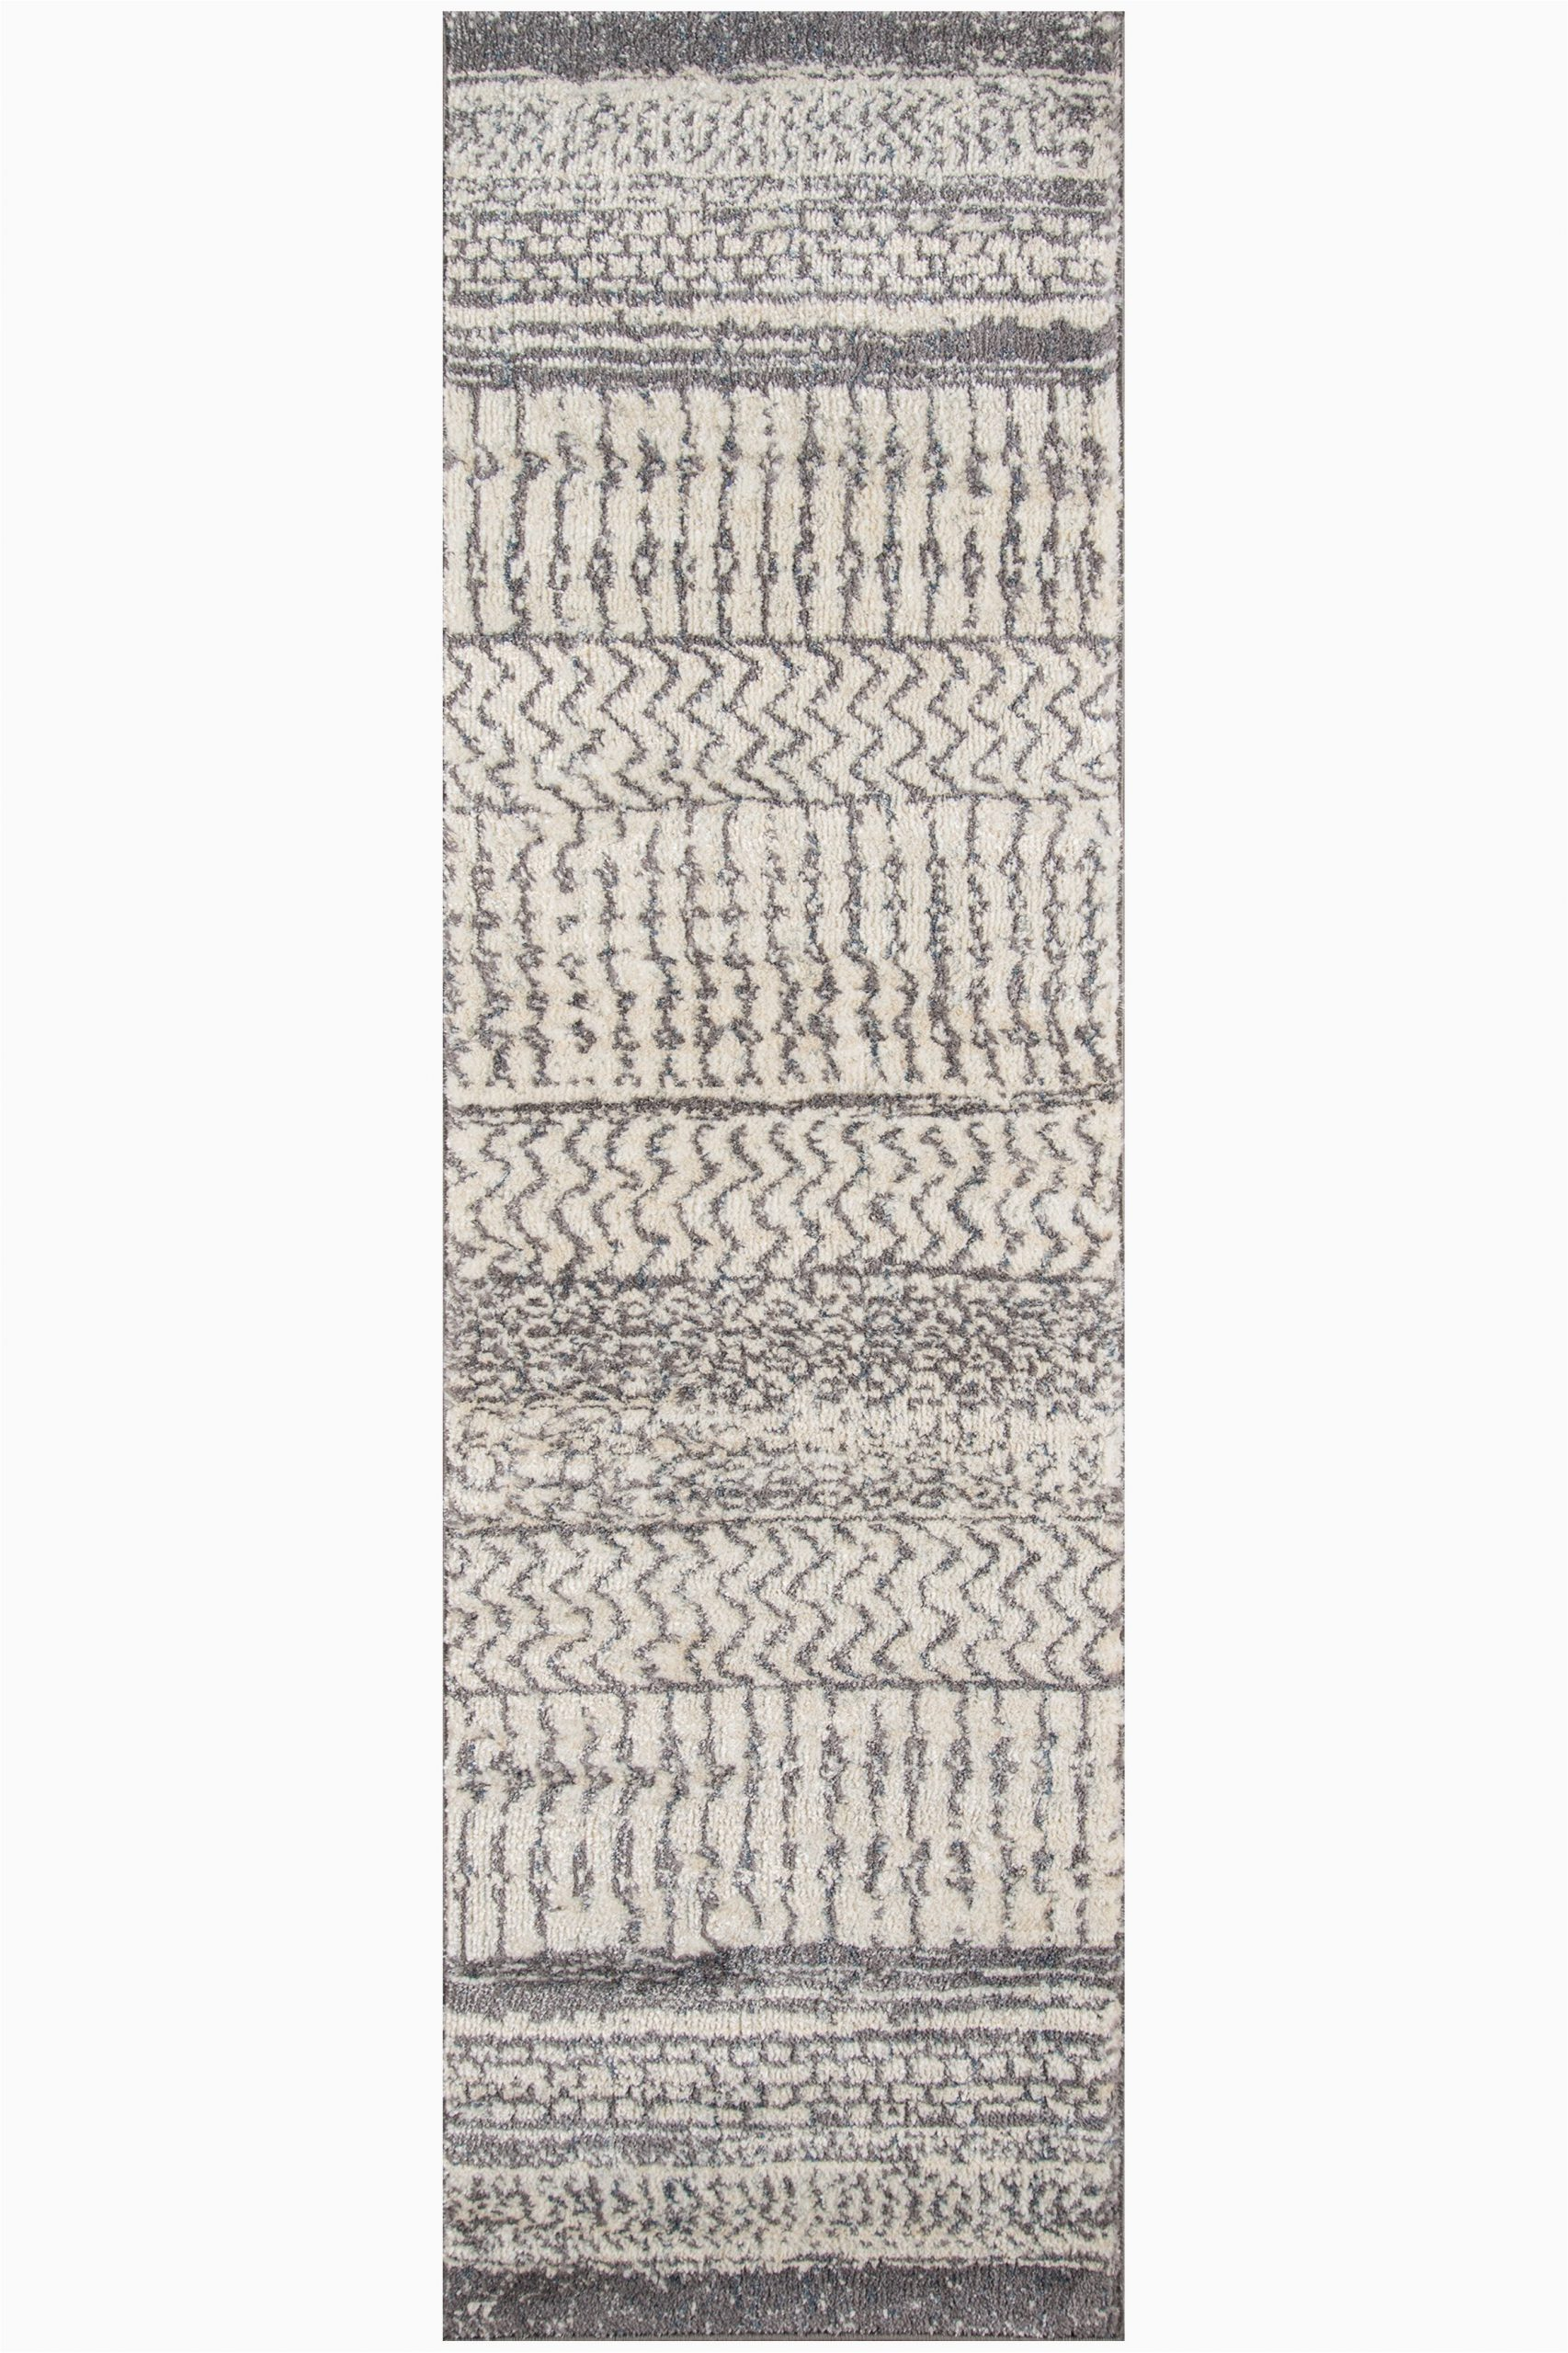 danny grayivory area rug mtna1779 piid= &sku=mtna1779